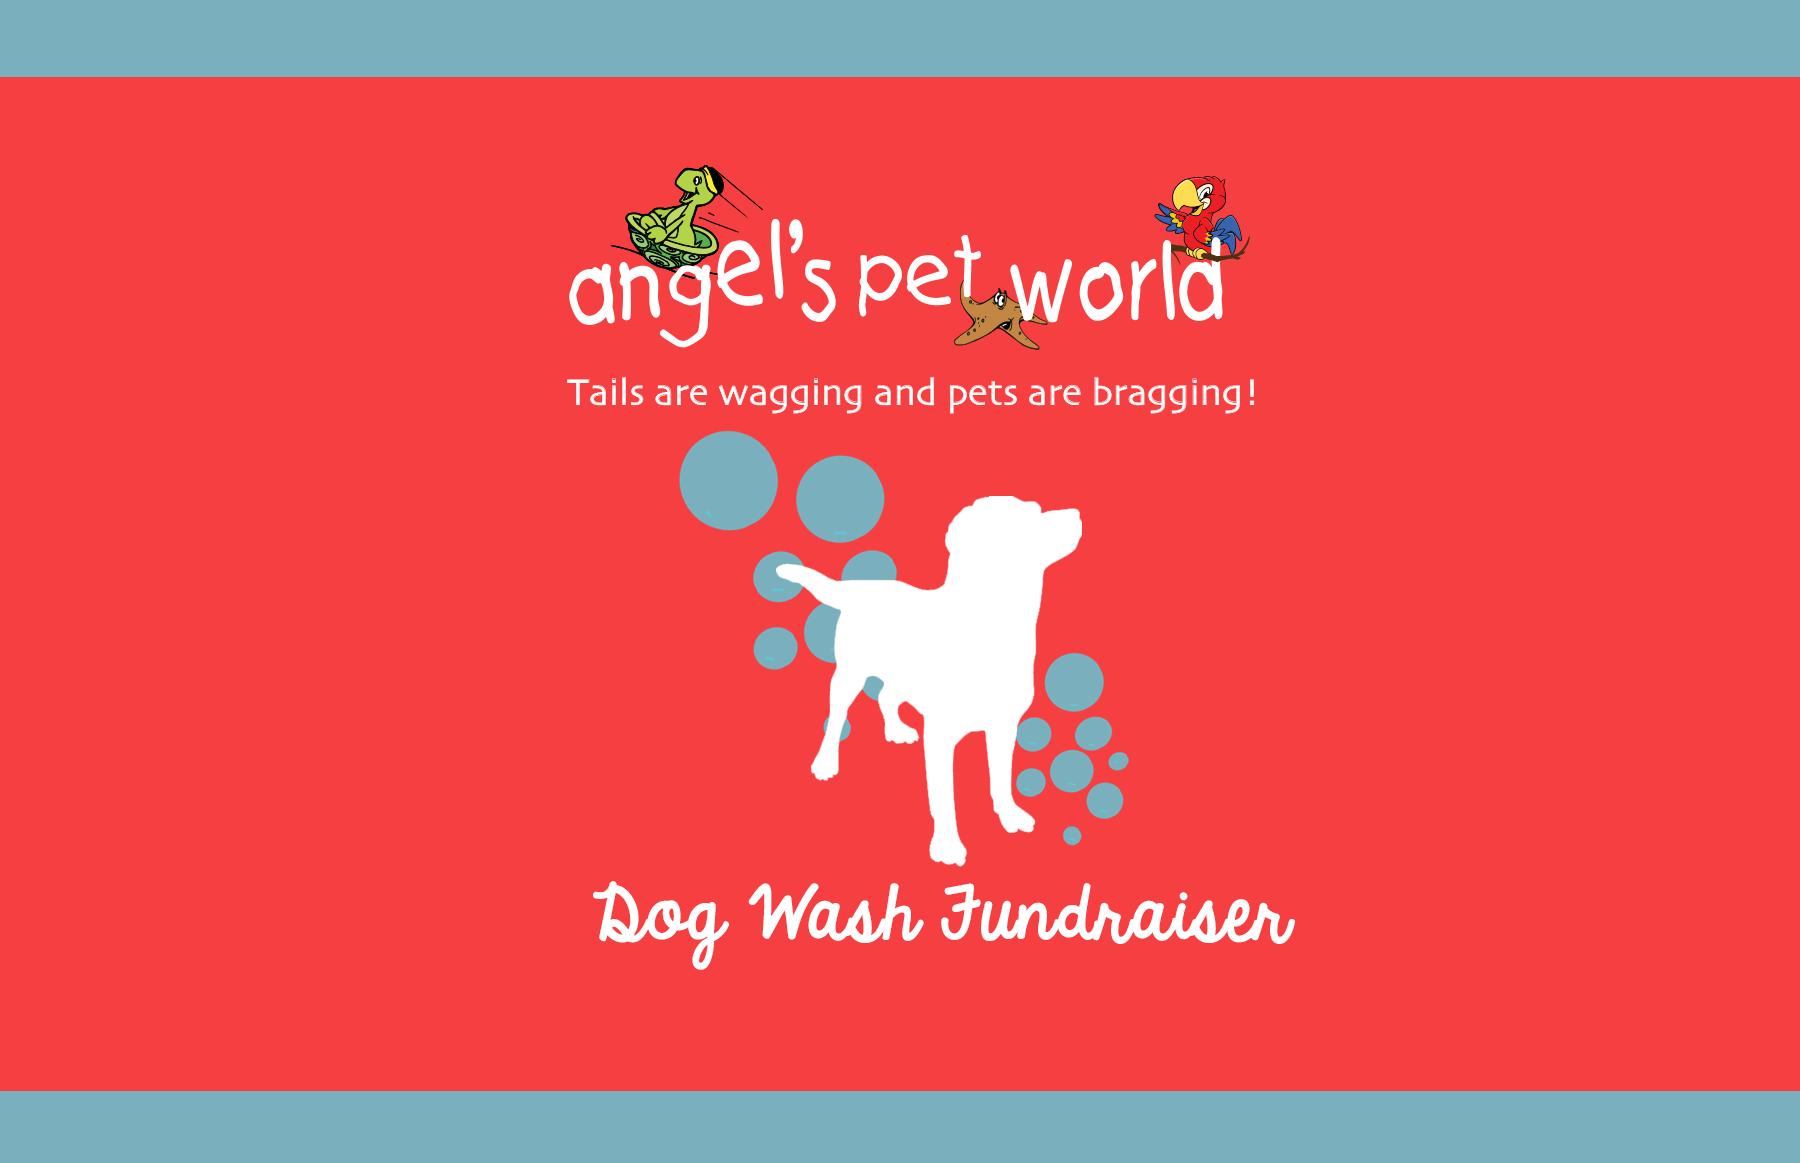 dog-wash-fundraiser-price-match-angels-pet-world-pet-supply-hudson-angels-pet-world